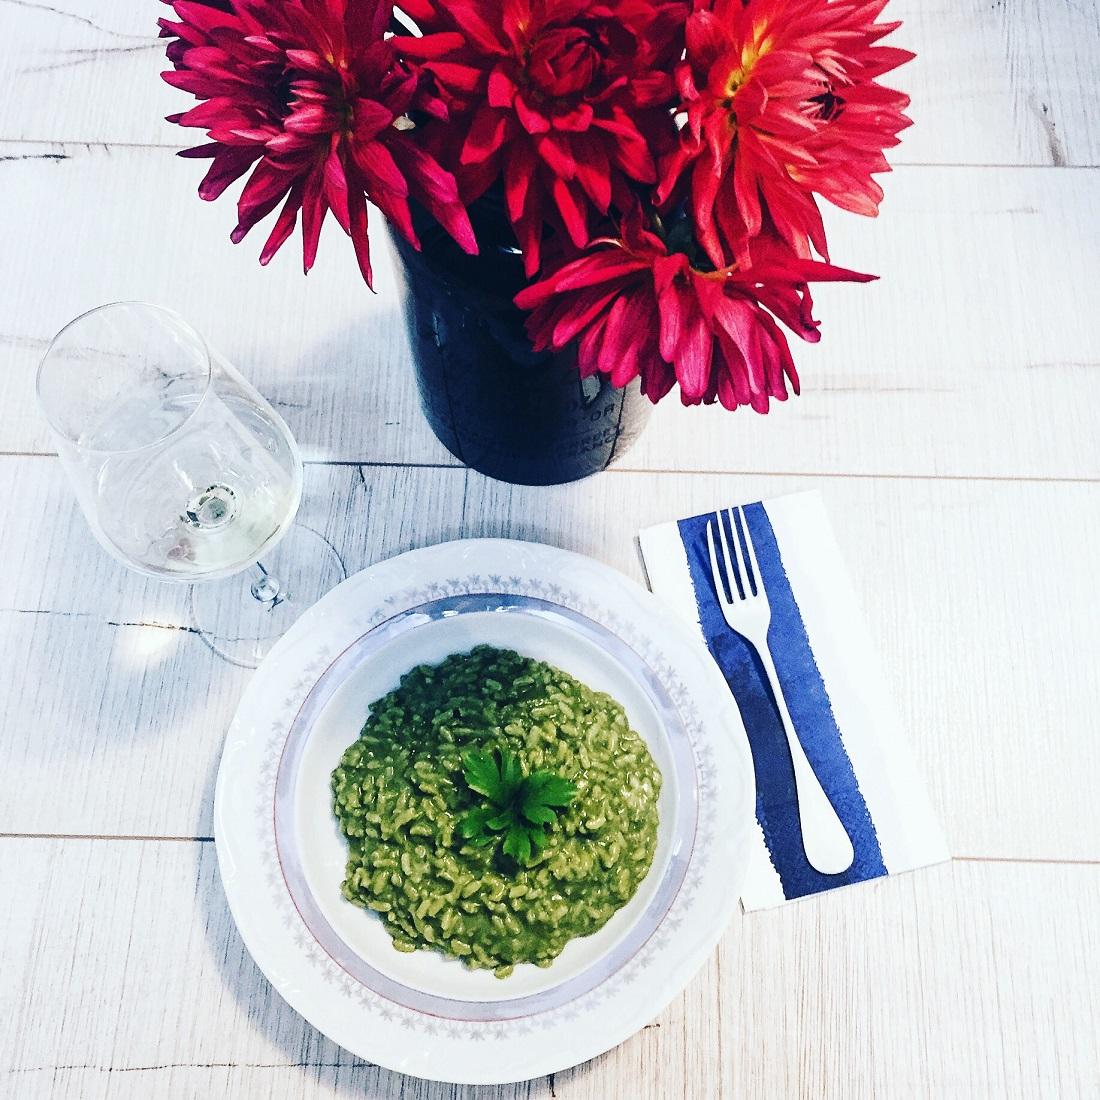 @pfairytale Creamy Spinach Risotto